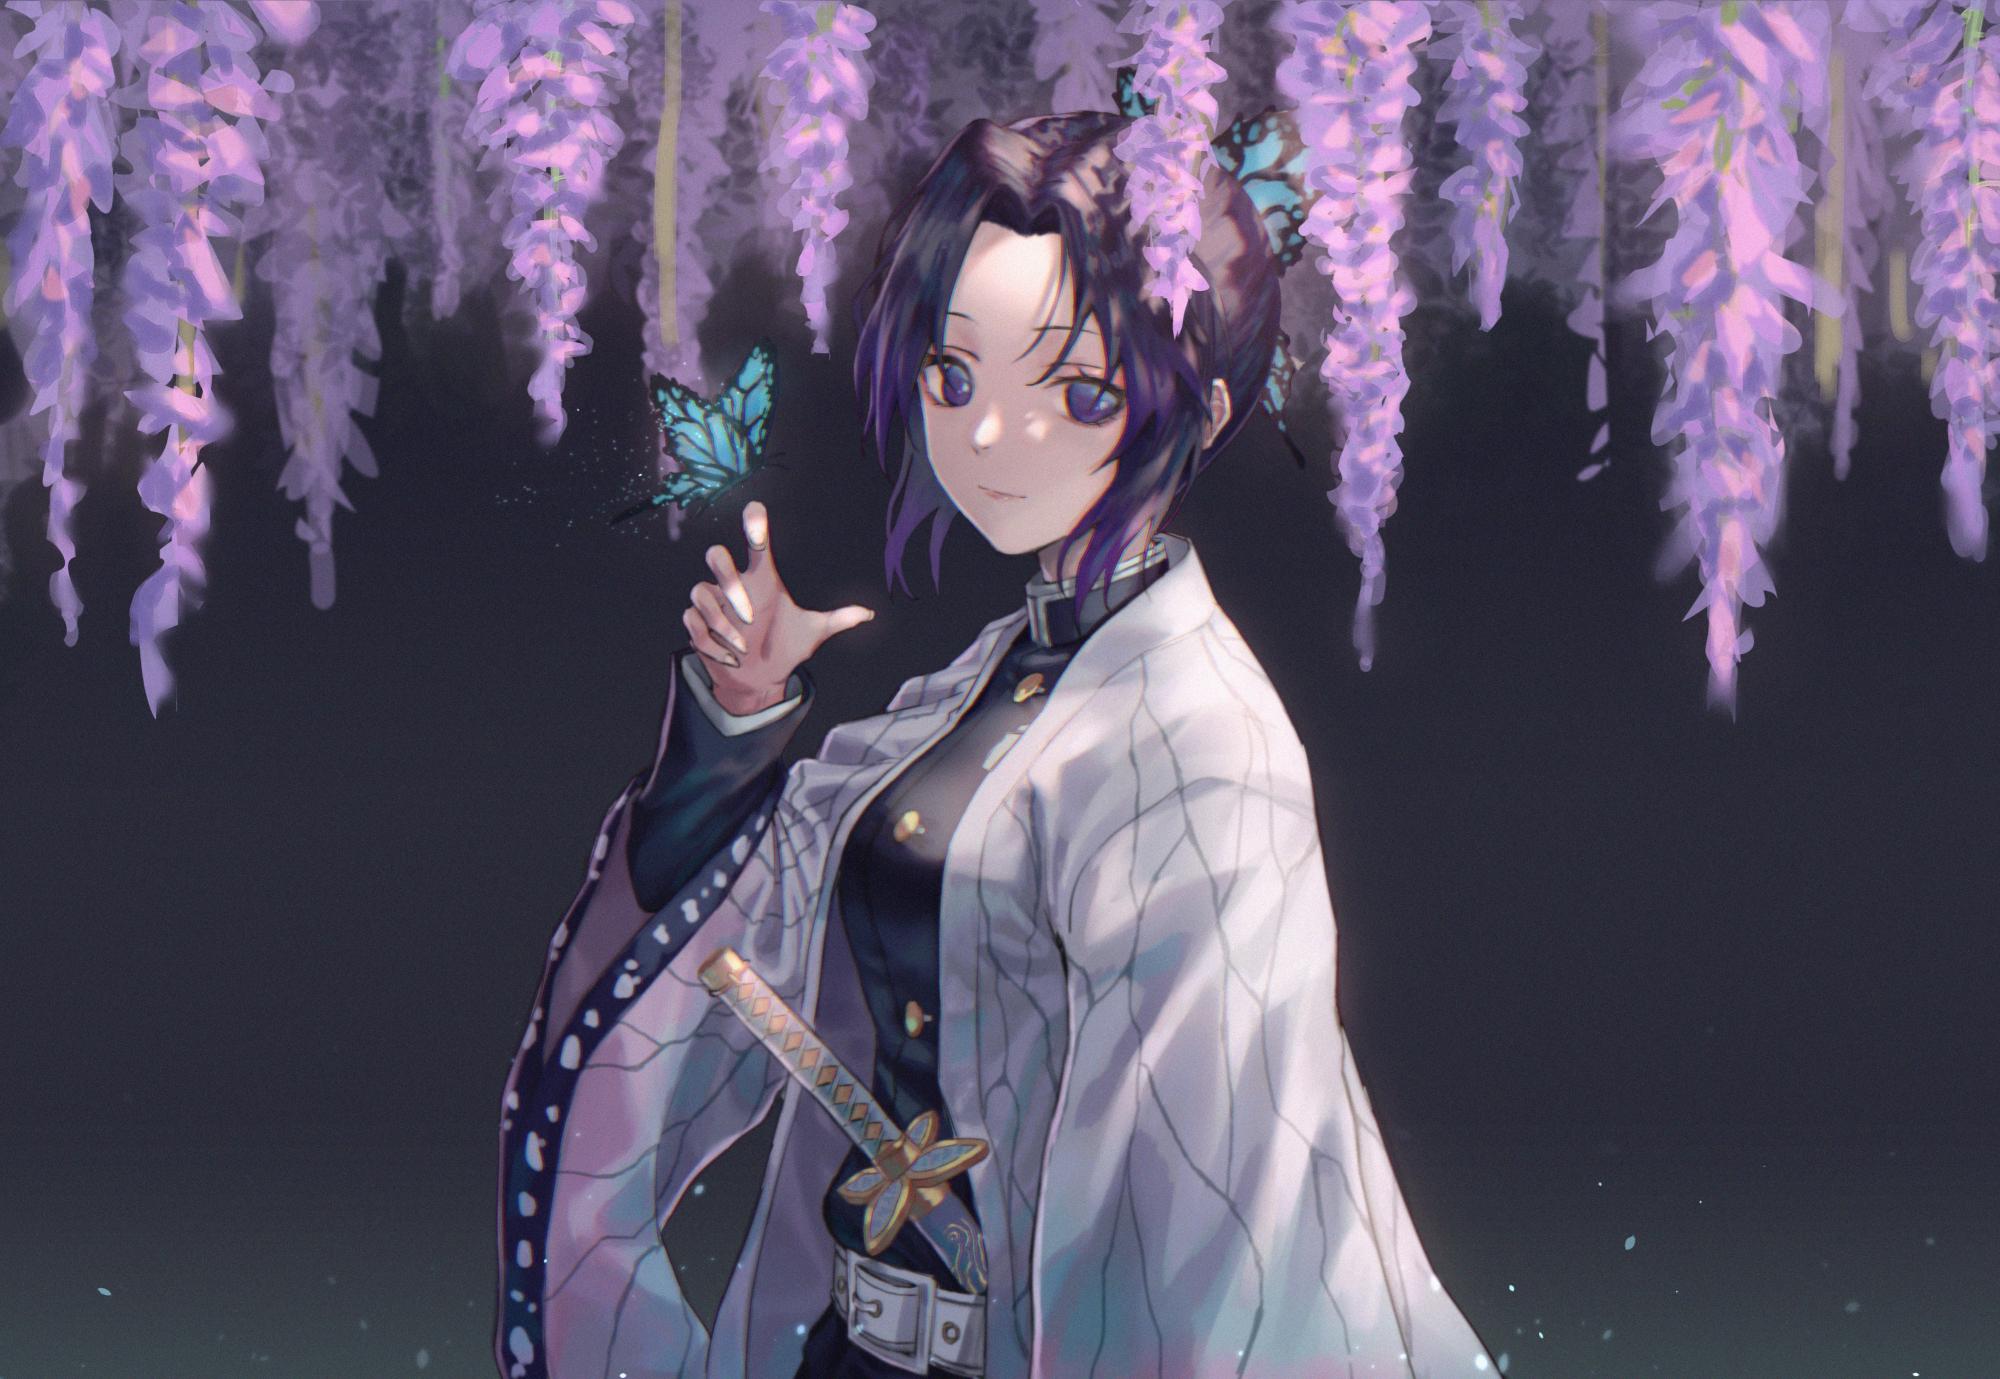 Anime 2000x1379 anime anime girls digital art artwork portrait 2D Kimetsu no Yaiba Japanese kimono katana Kochou Shinobu butterfly black hair multi-colored hair